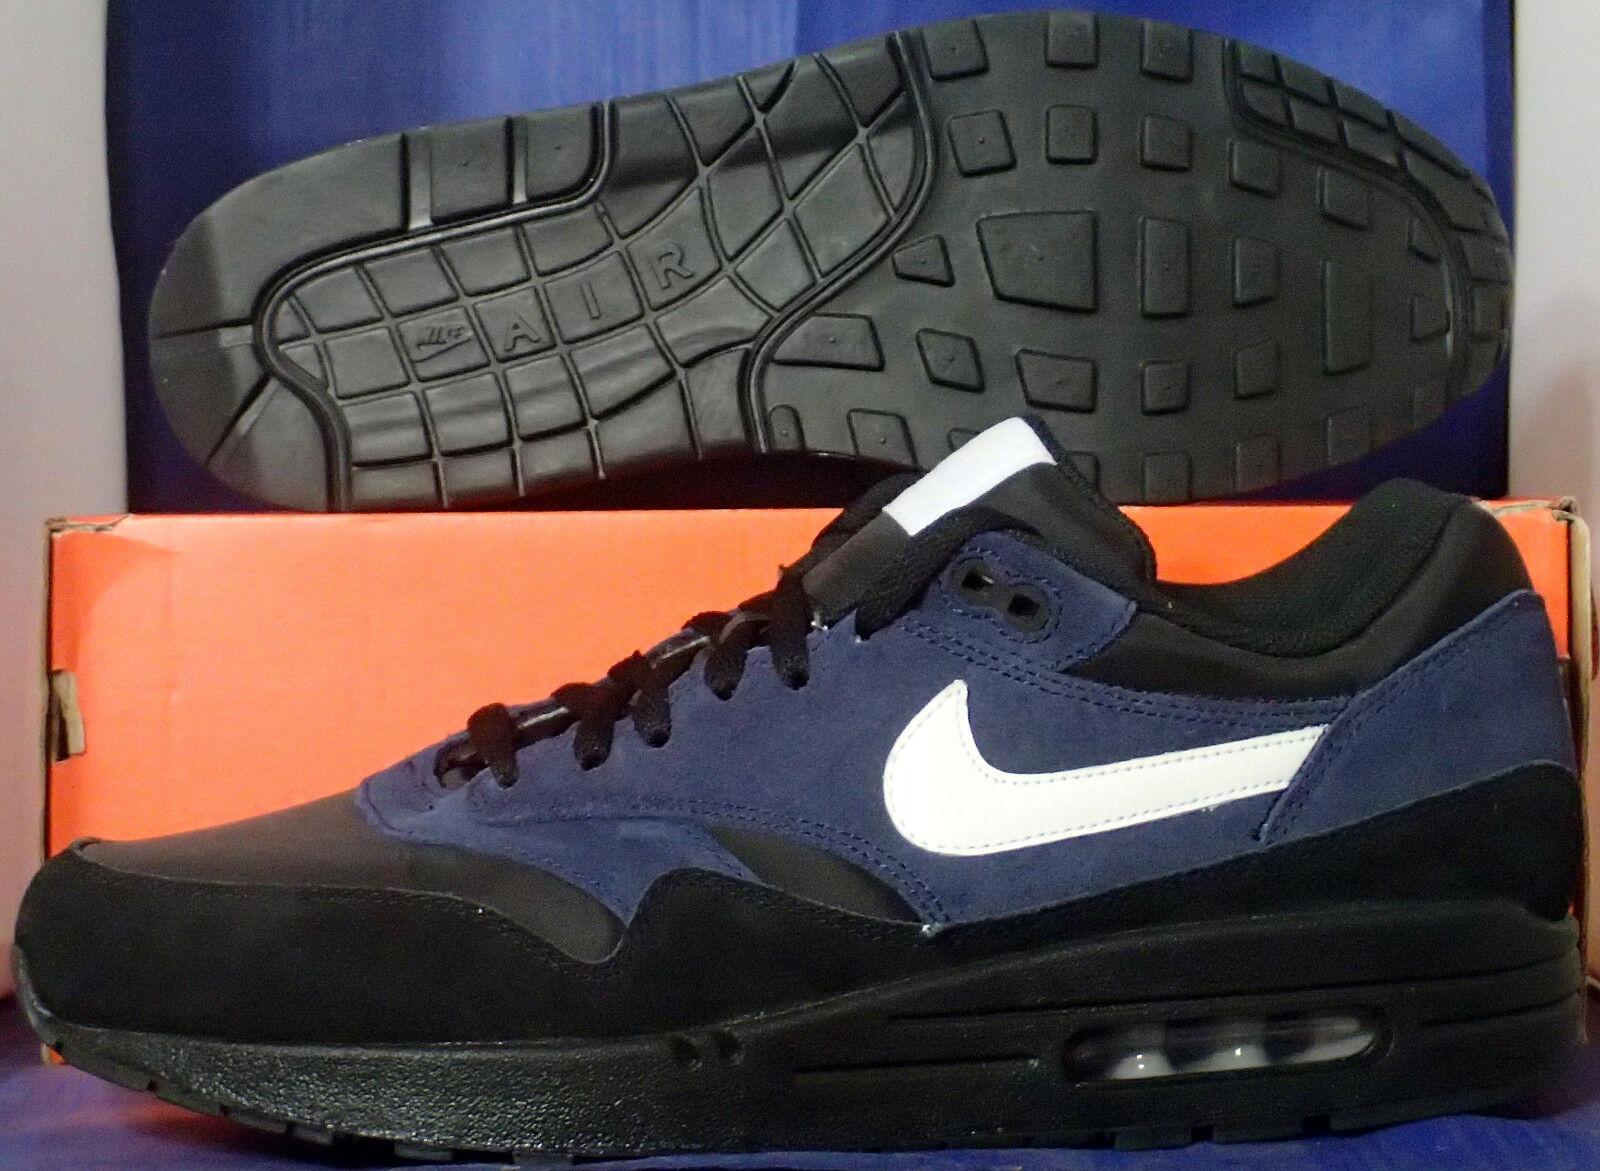 Nike Air Max 1 iD Black Navy Blue White SZ 12 ( 433213-998 )